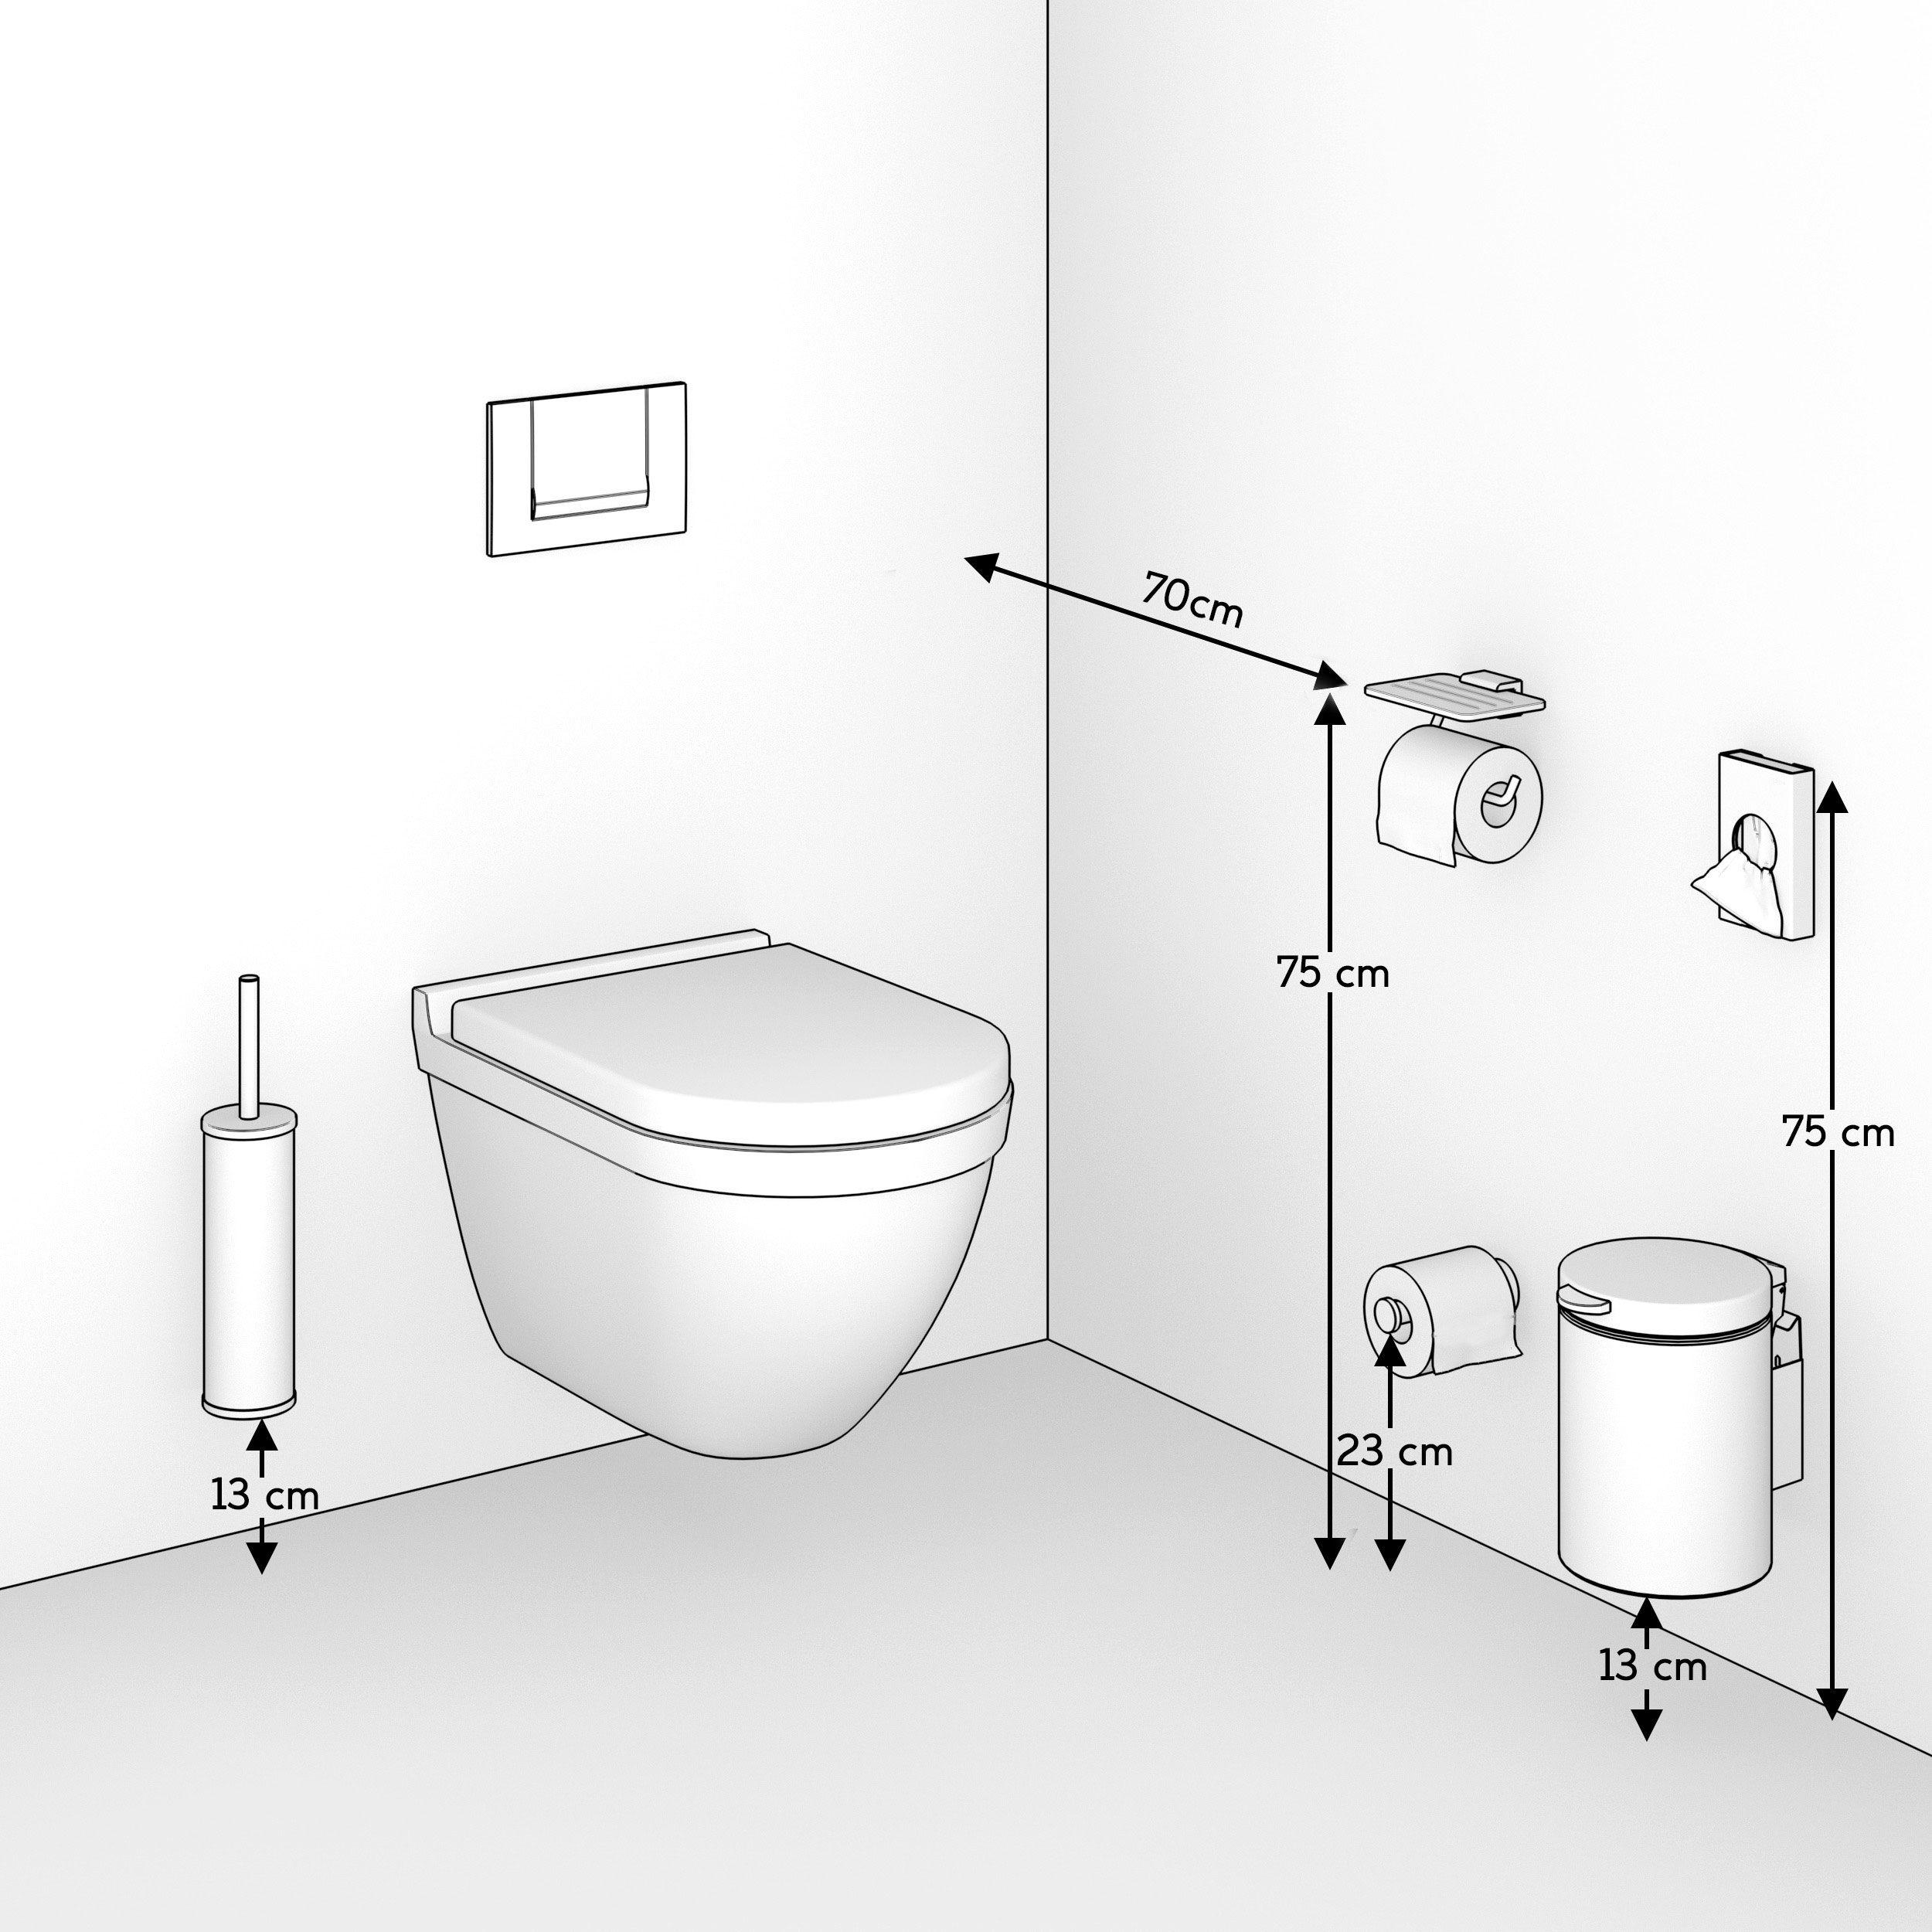 Rezultat Poiska Google Dlya Https Www Klusidee Nl Forum Userpix2 51559 Afmetingen 1 Gif Dizajn Ubornoj Sovremennyj Tualet Dizajn Nebolshoj Vannoj